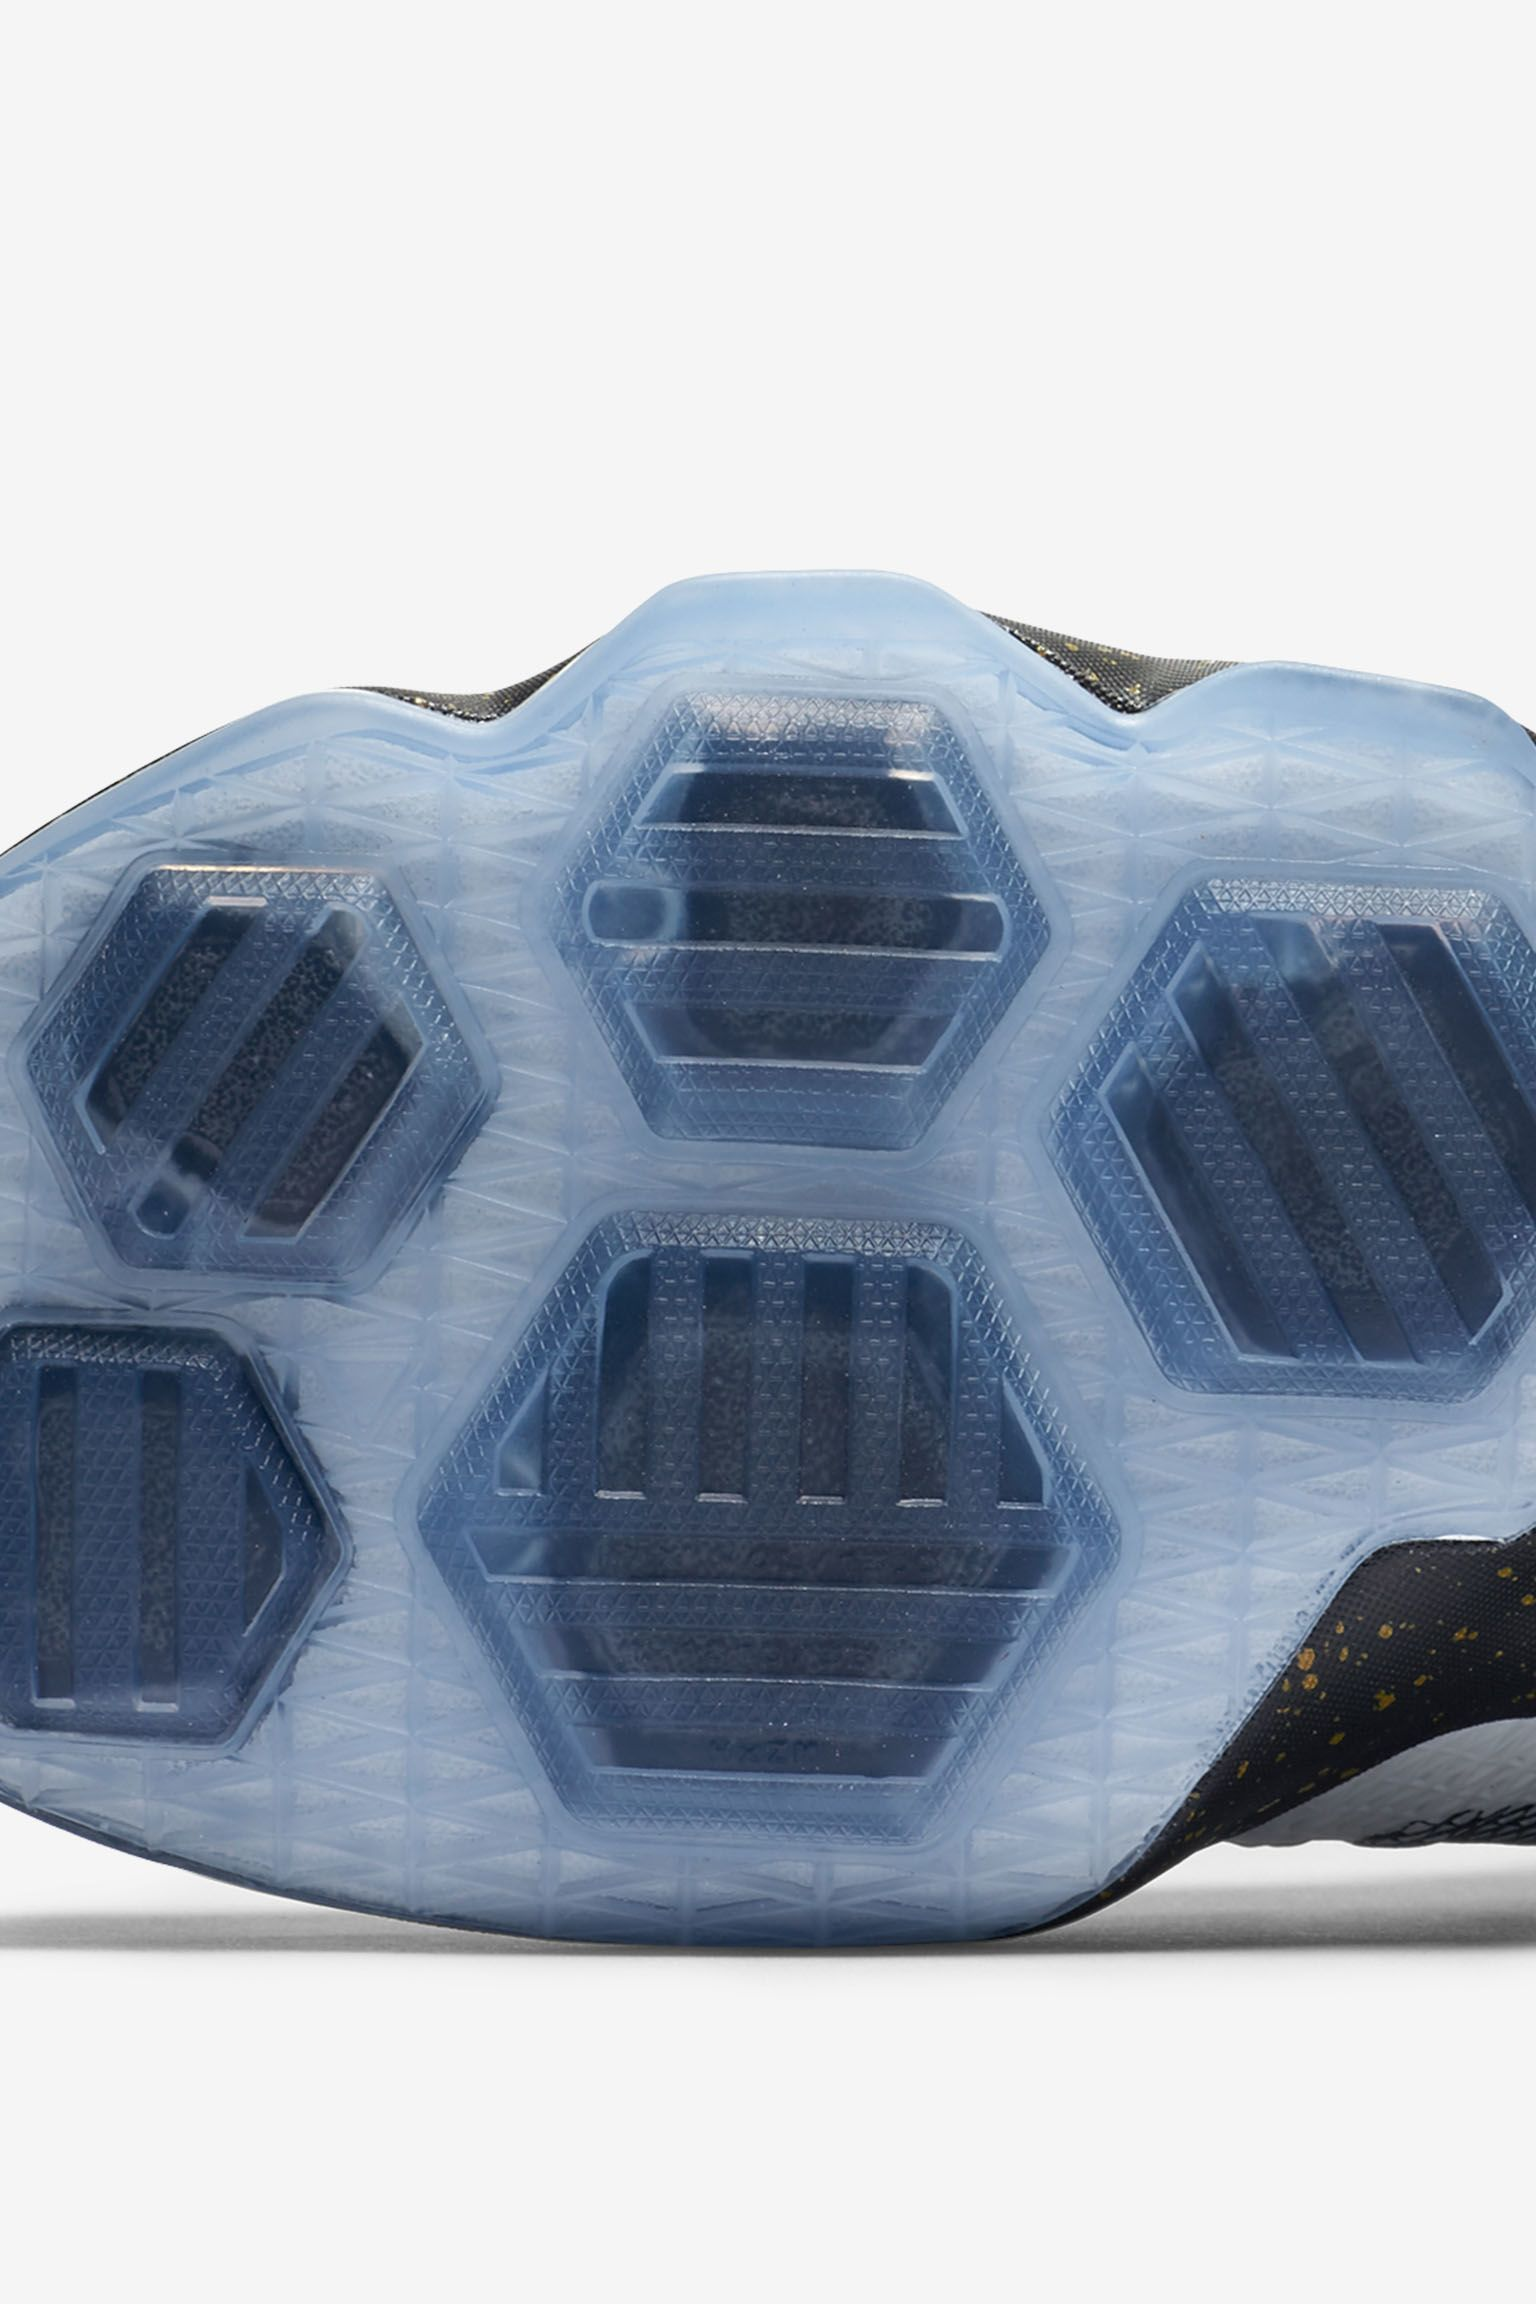 Nike Lebron 13 Elite 'Championship Ready' Release Date